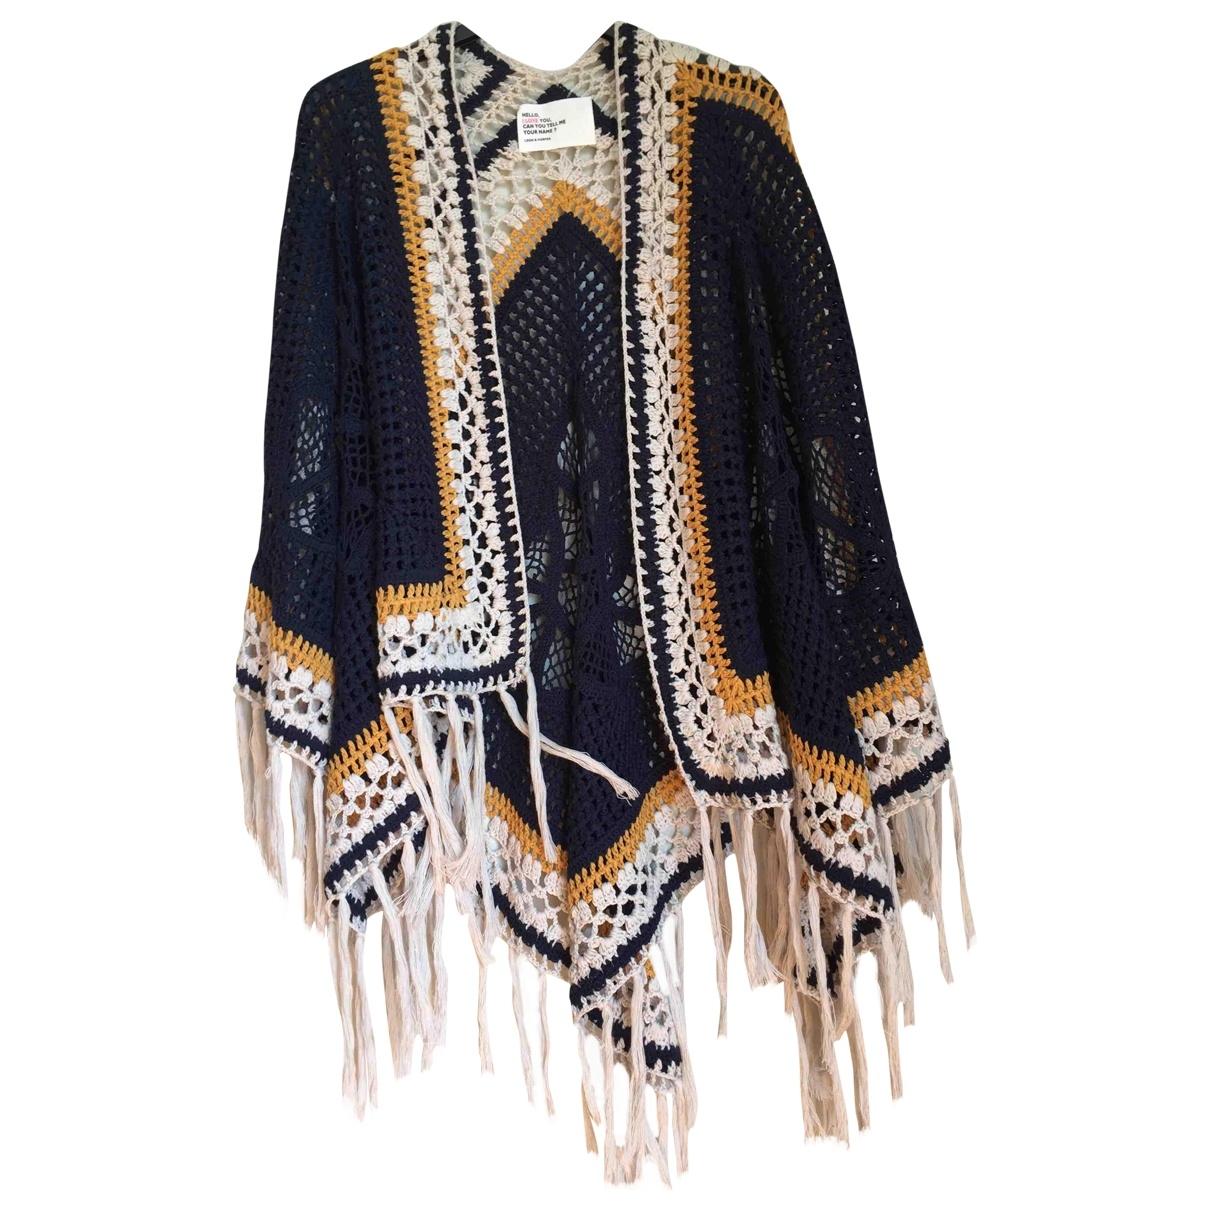 Leon & Harper \N Multicolour Cotton jacket for Women One Size FR